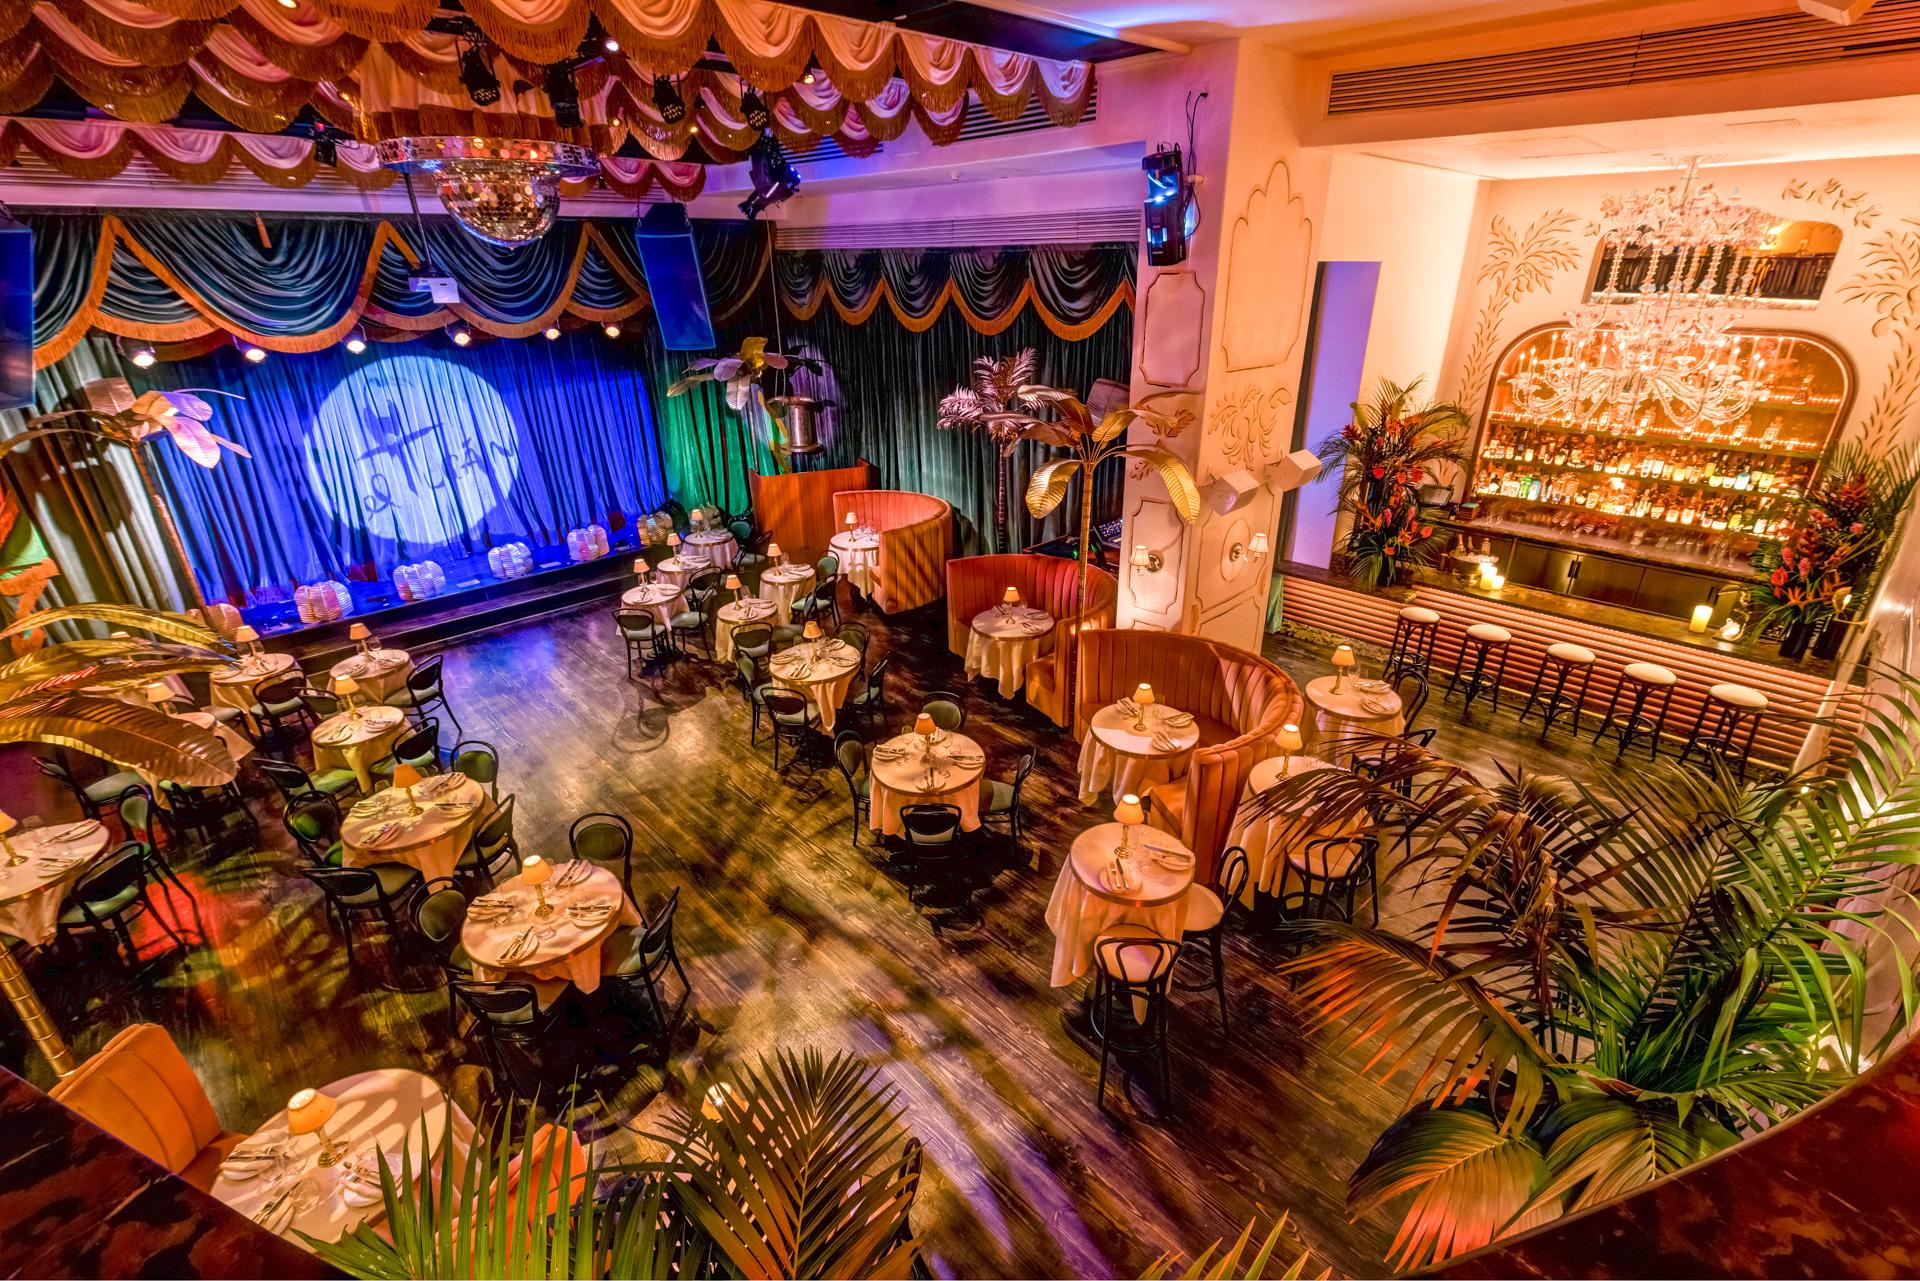 Scallops & Curtains for El Tucan Miami